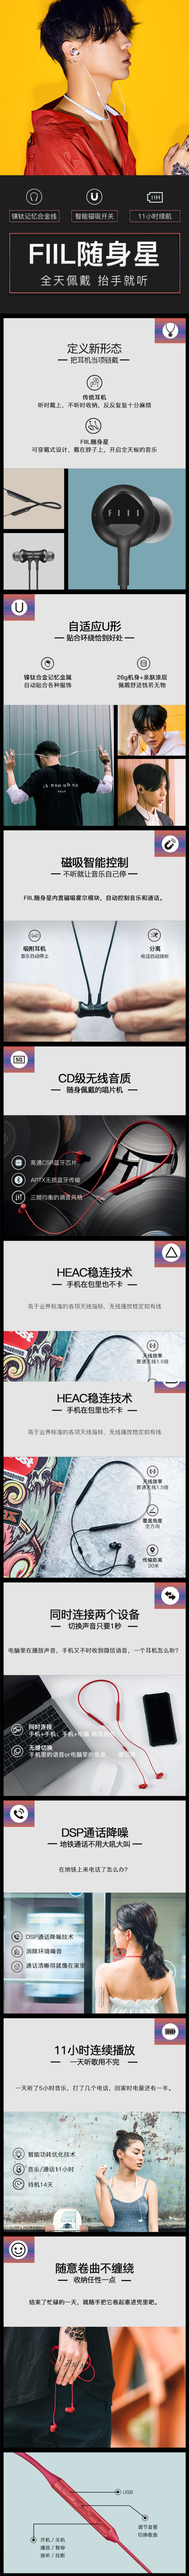 FIIL随身星蓝牙耳机免费试用,评测